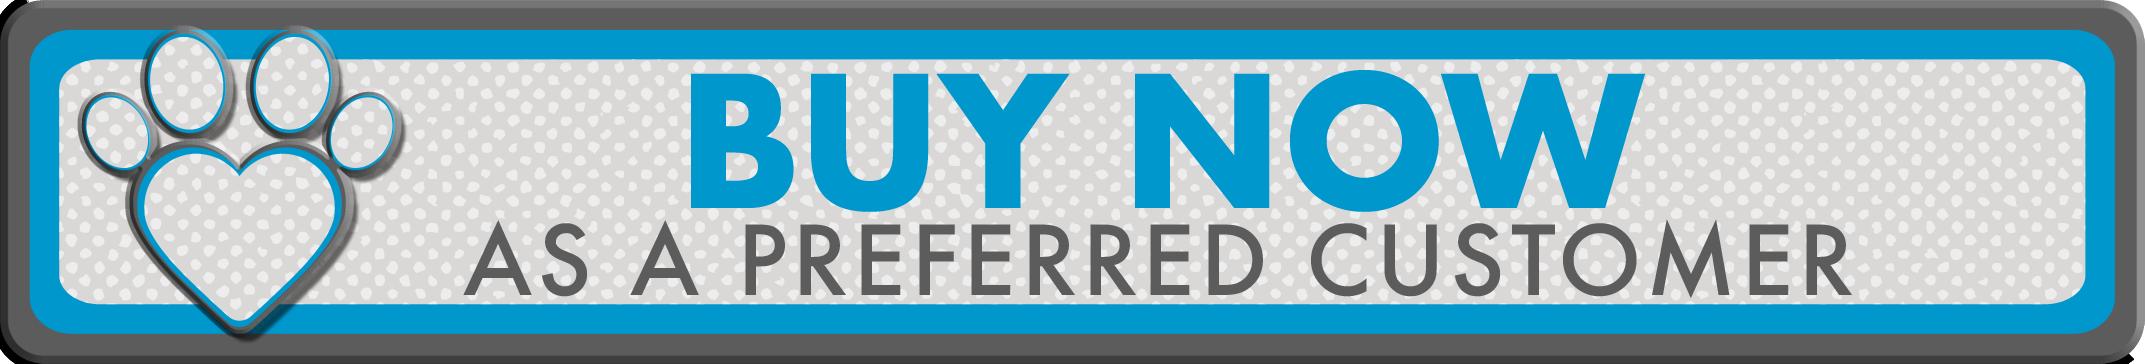 Shp buynow preferred